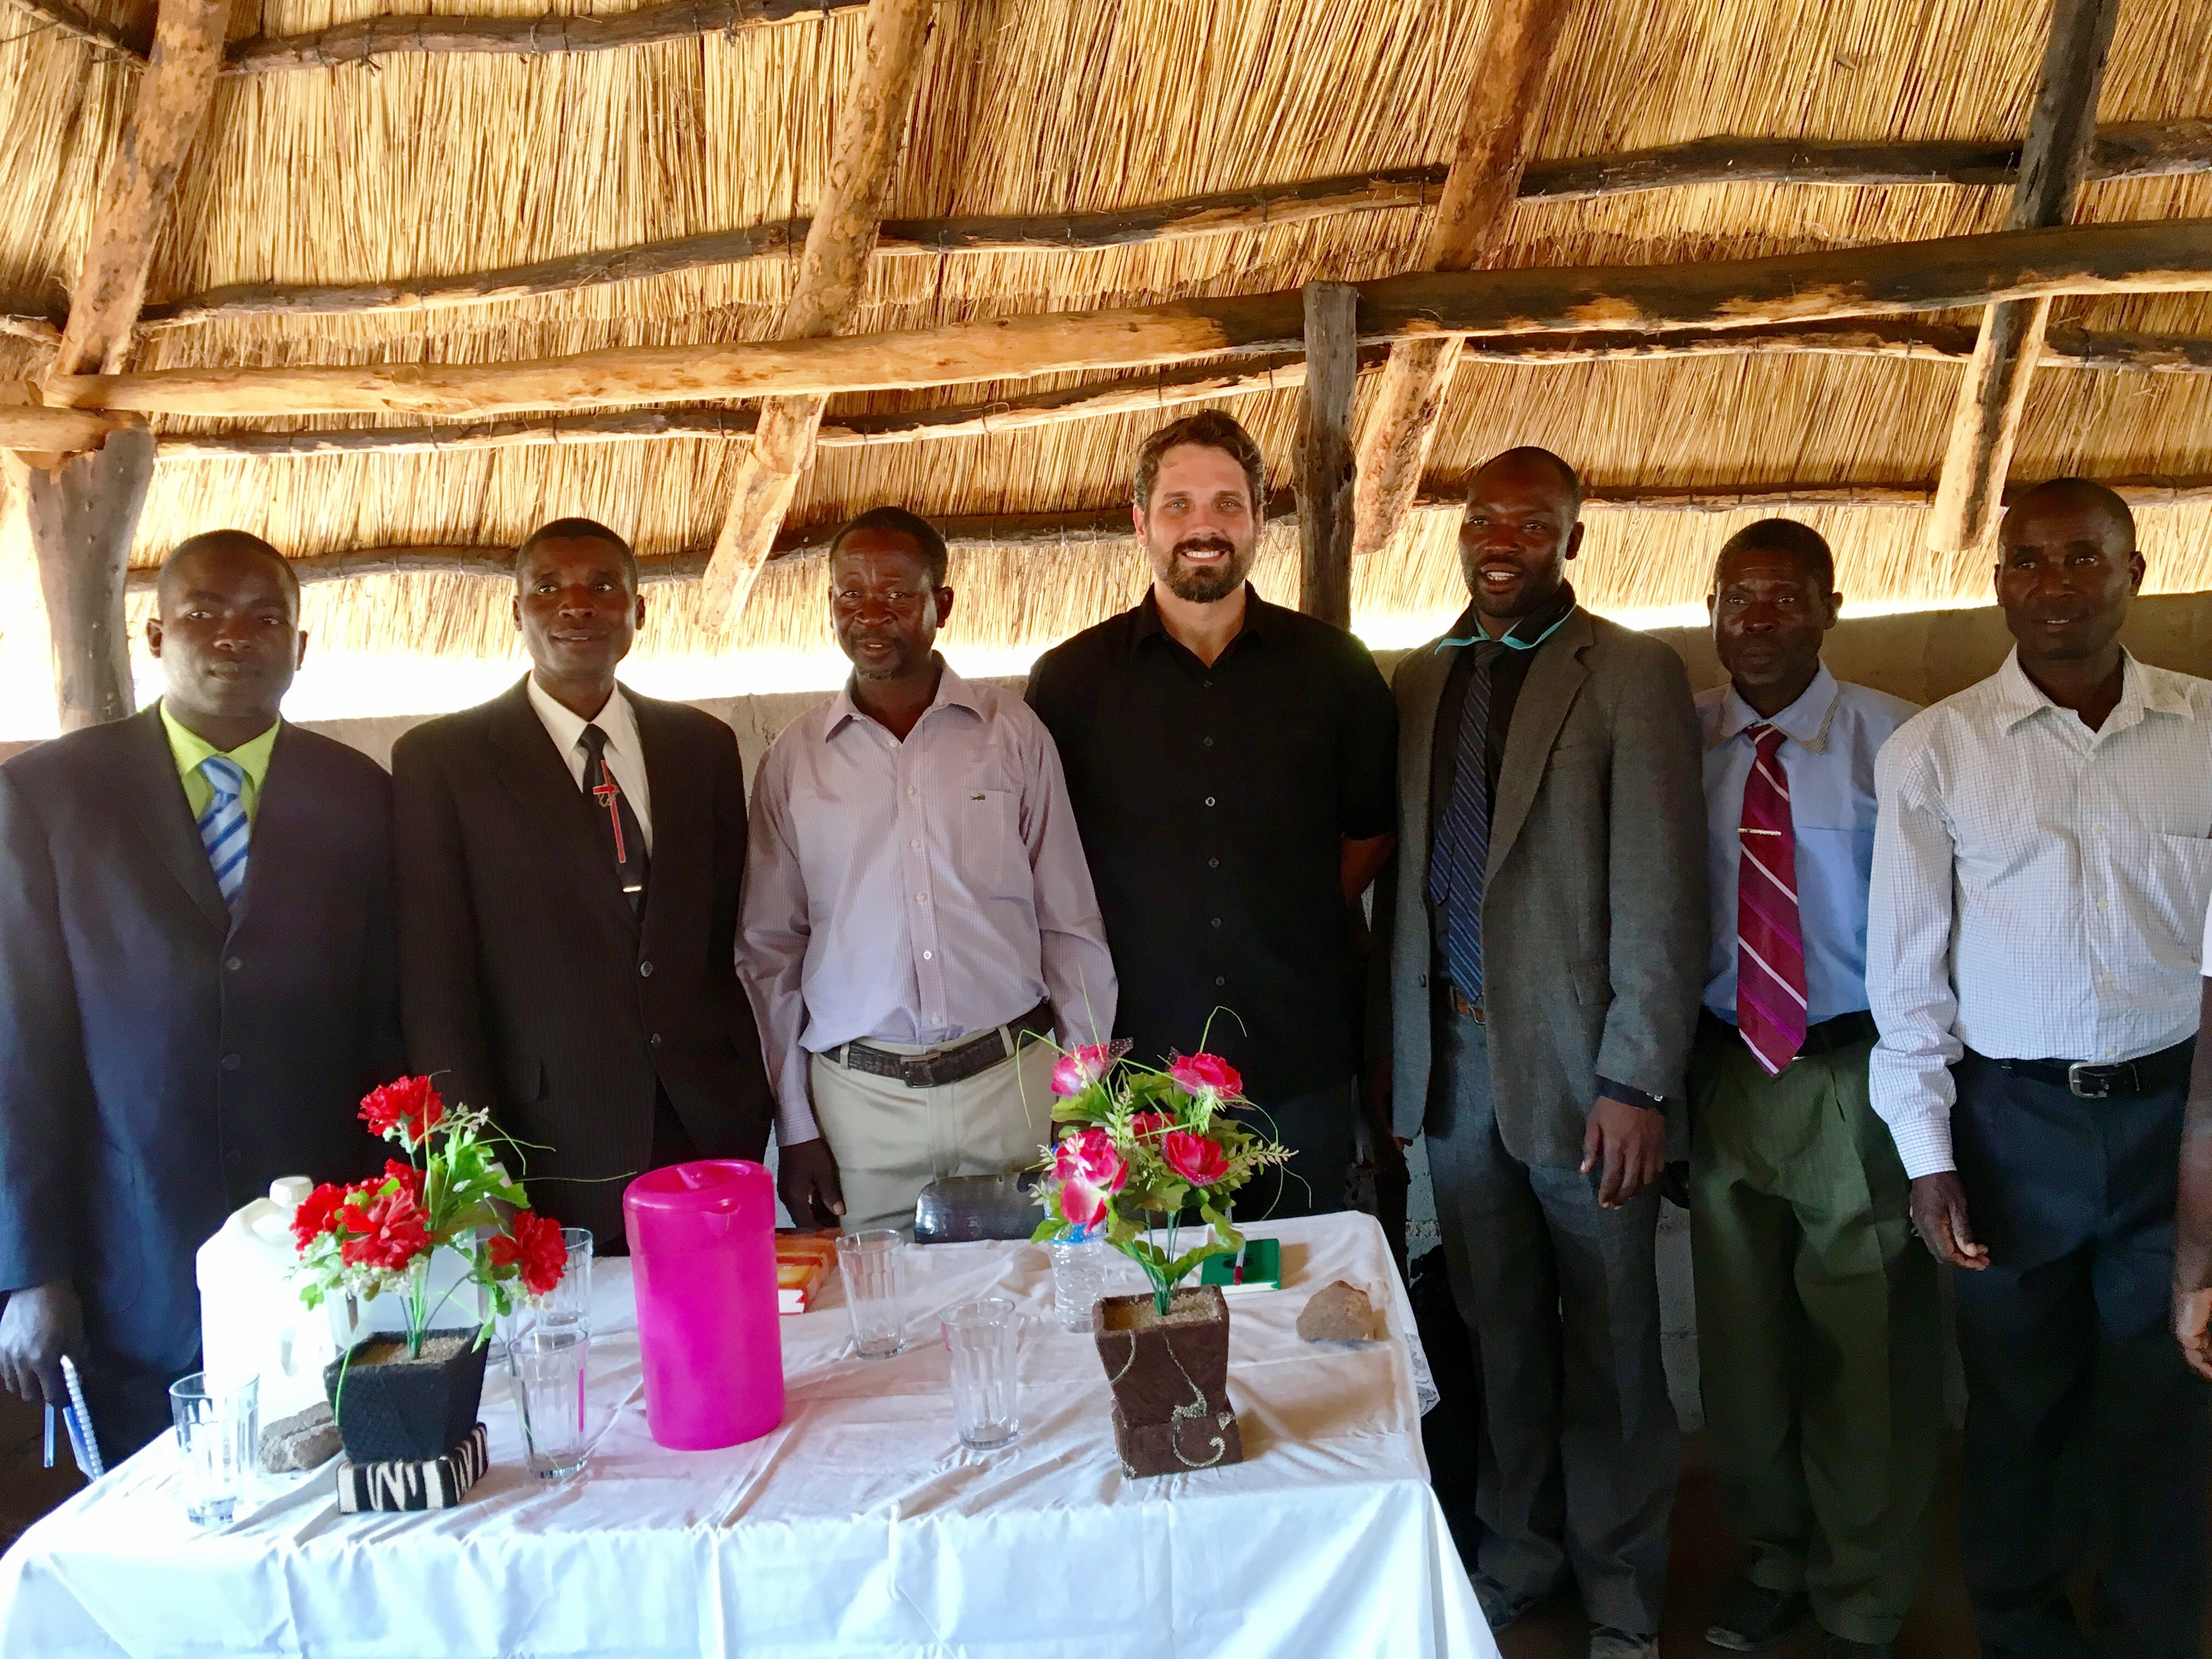 zimbabwe-church-leaders-with-mike-webb